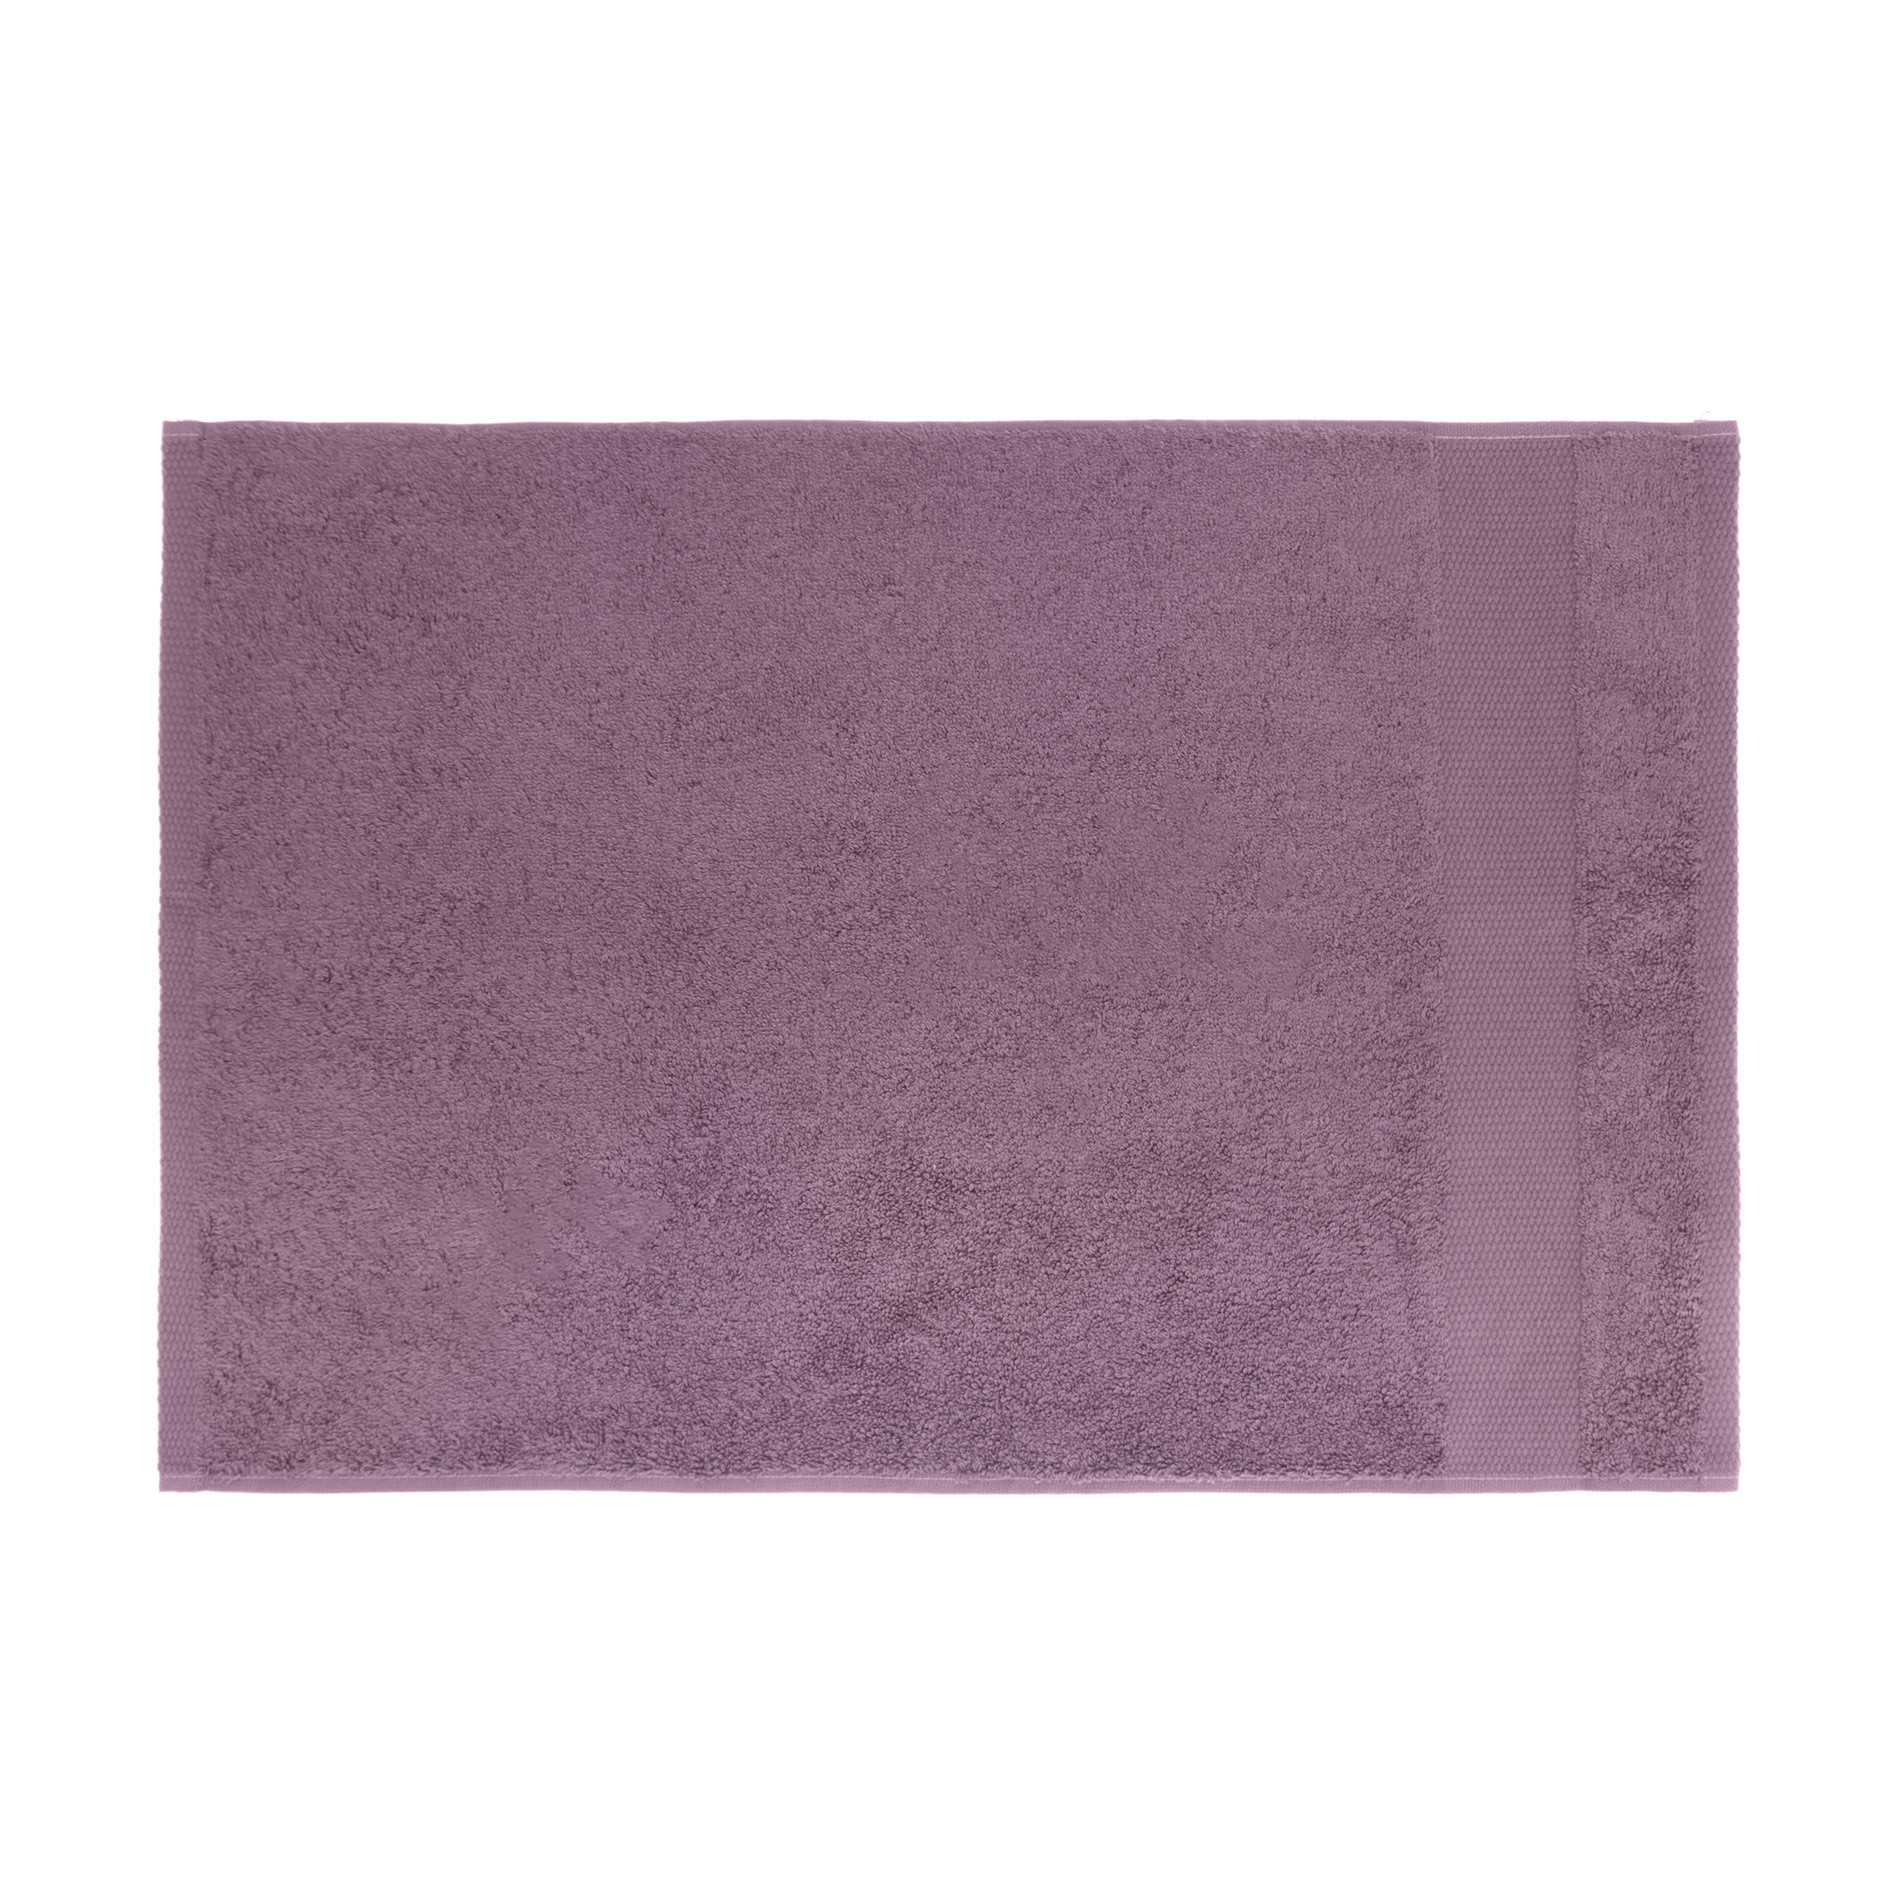 Asciugamano spugna di puro cotone Zefiro, Viola melanzana, large image number 1